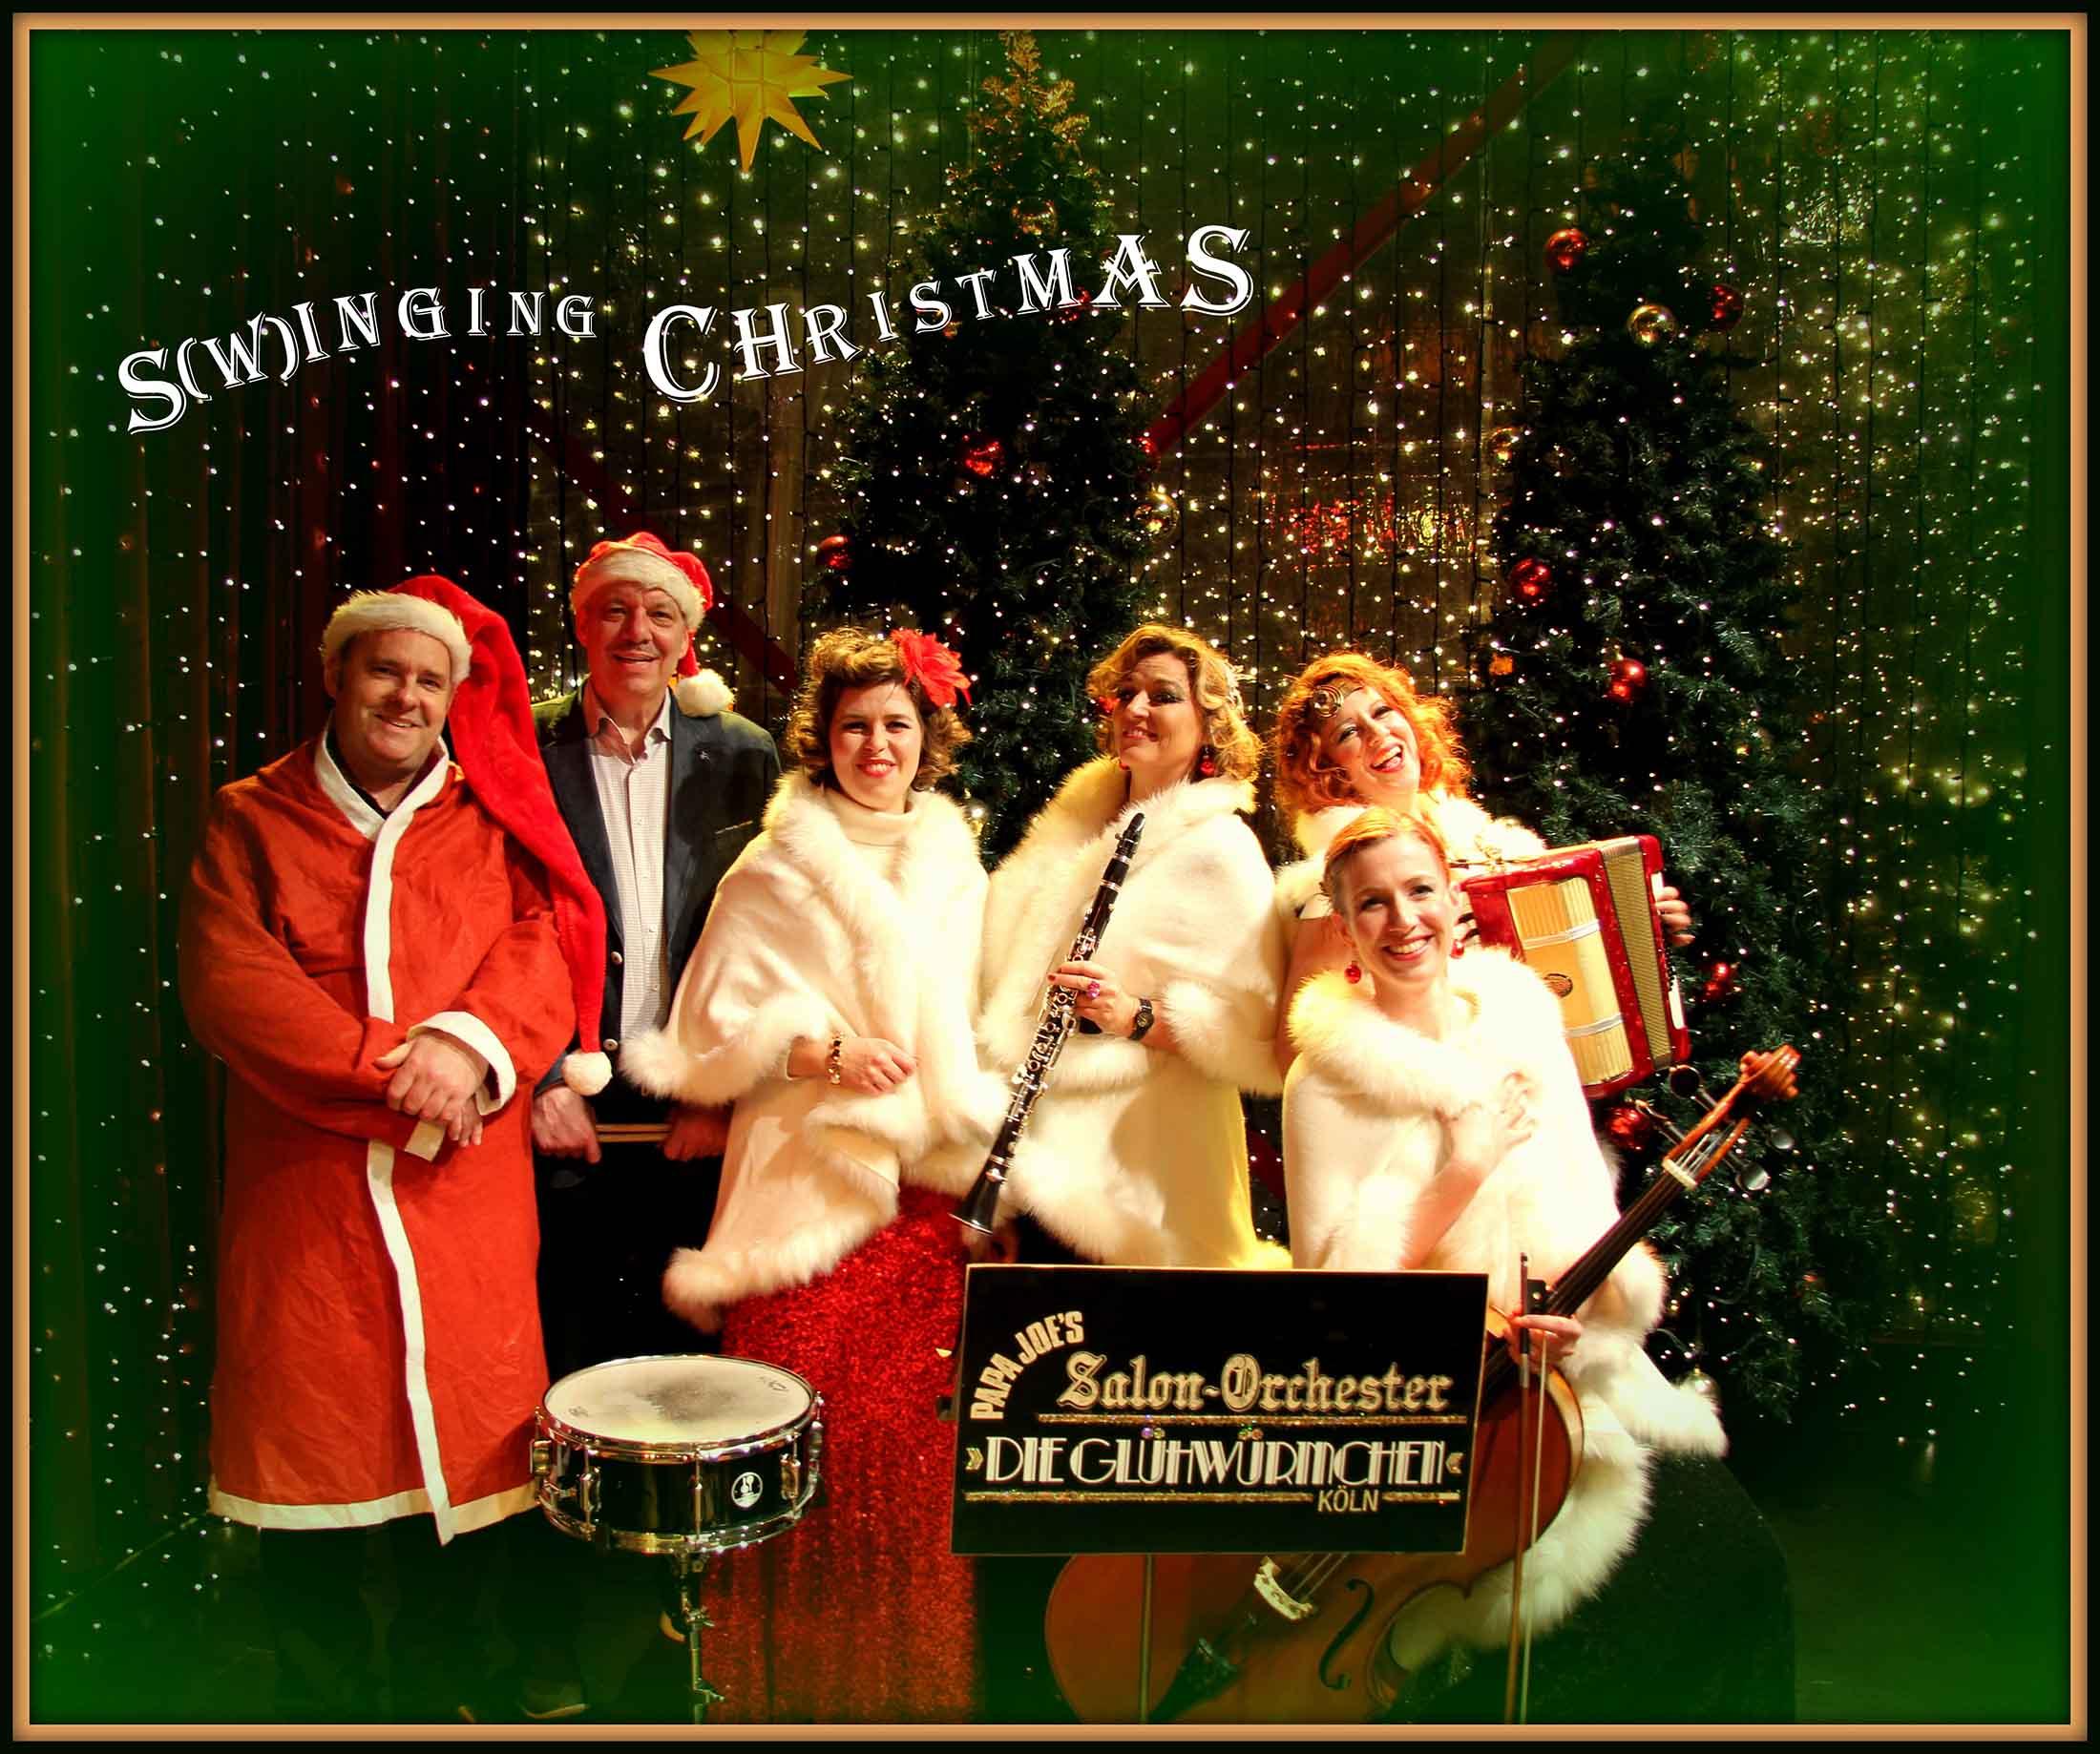 S(w)inging Christmas